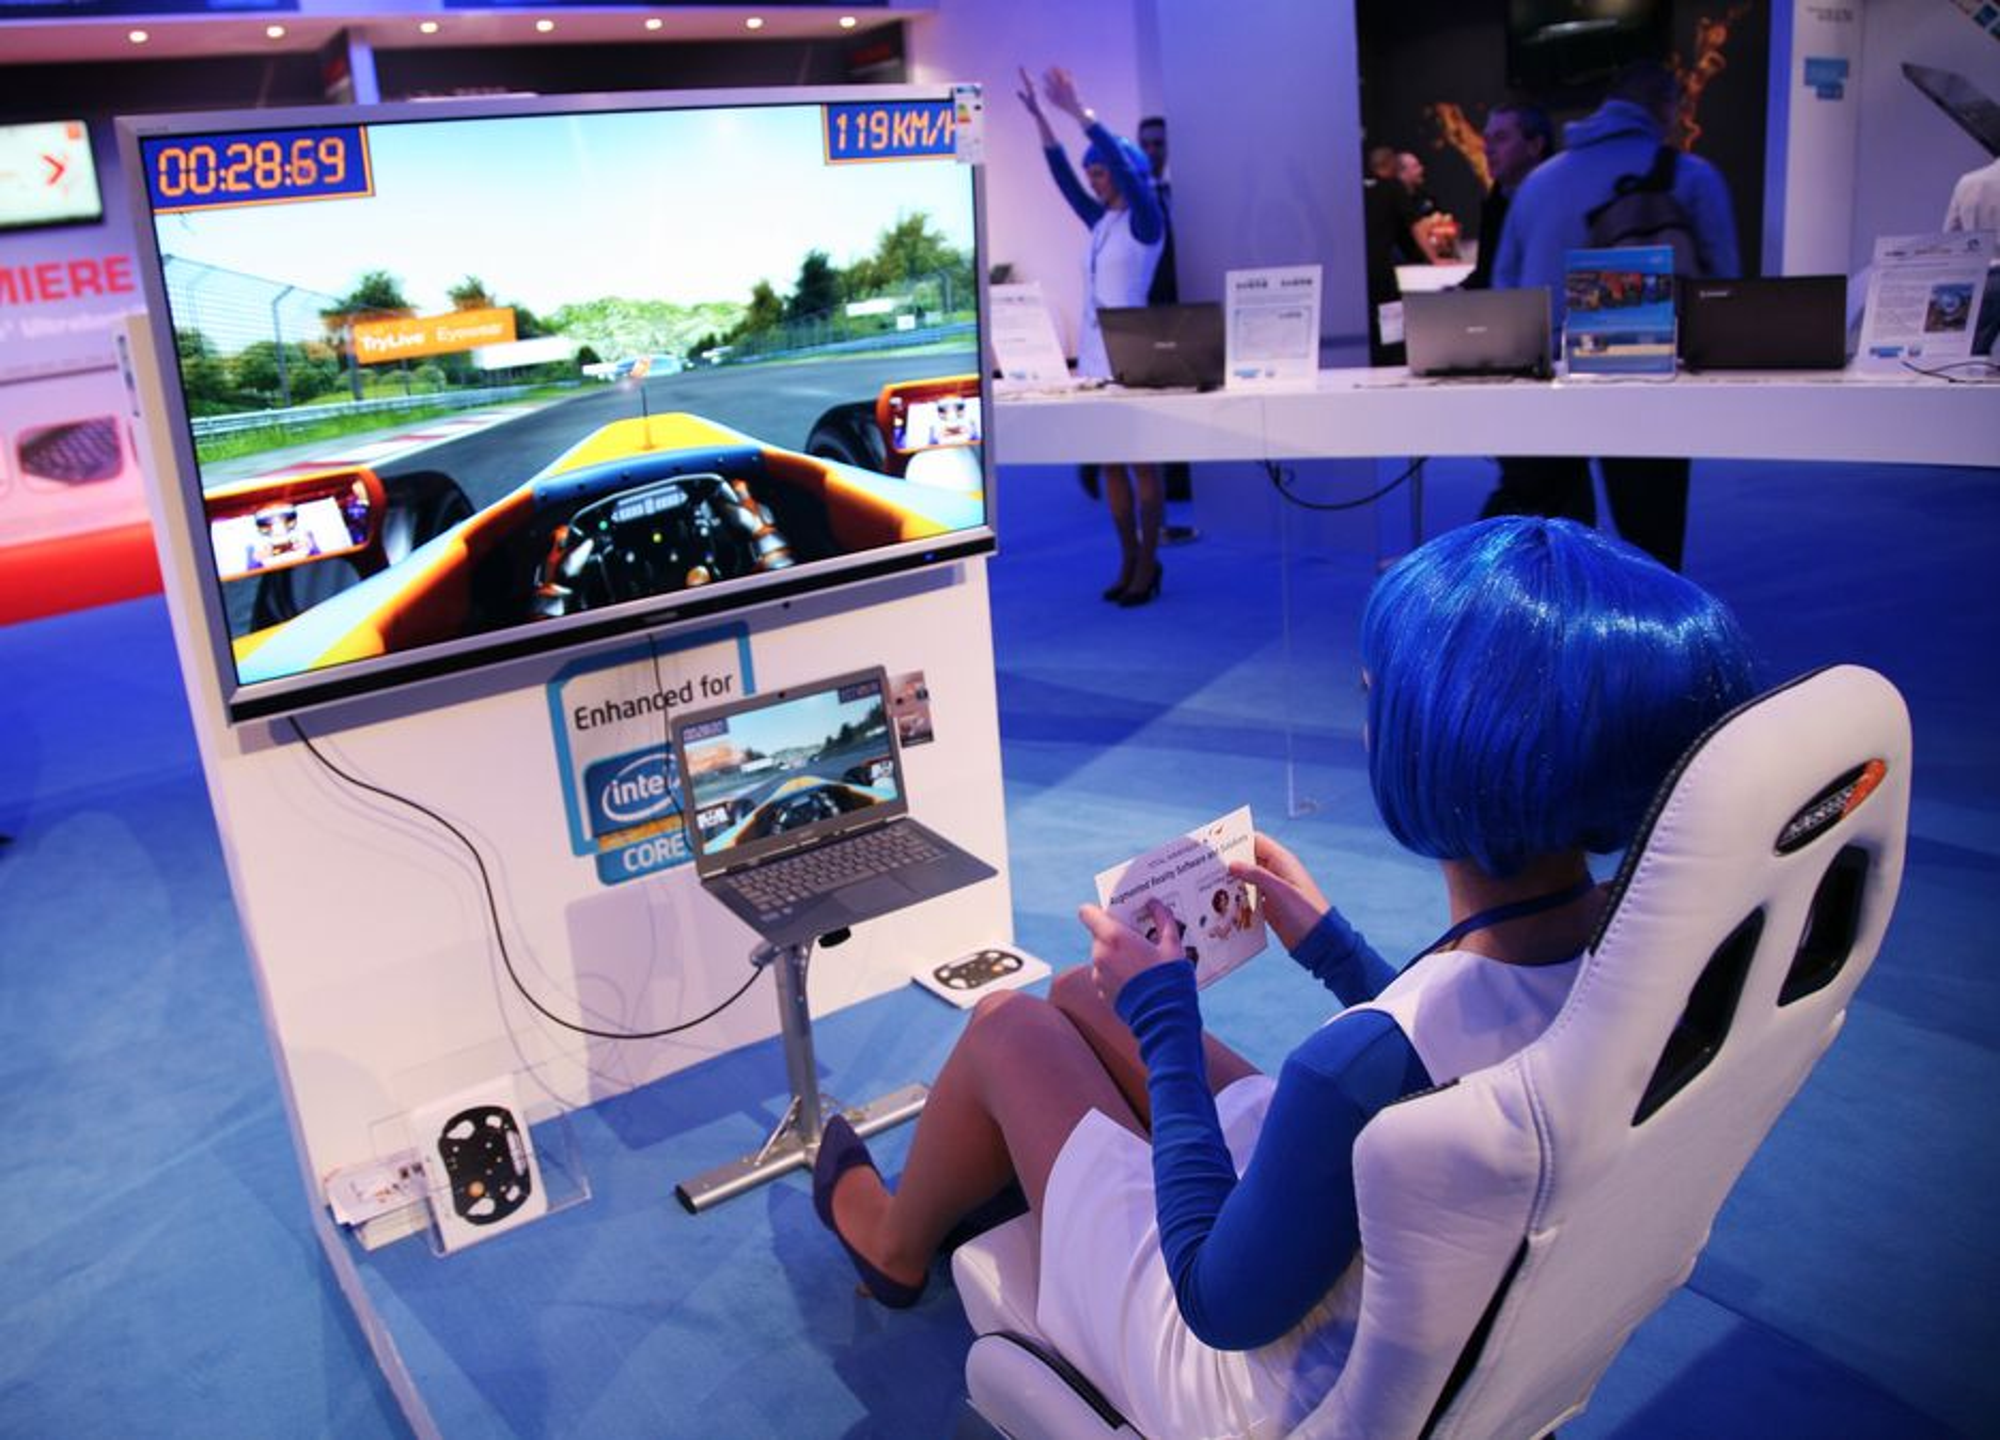 CeBIT: Hos Intel kunne folk prøve ut augmented reality.